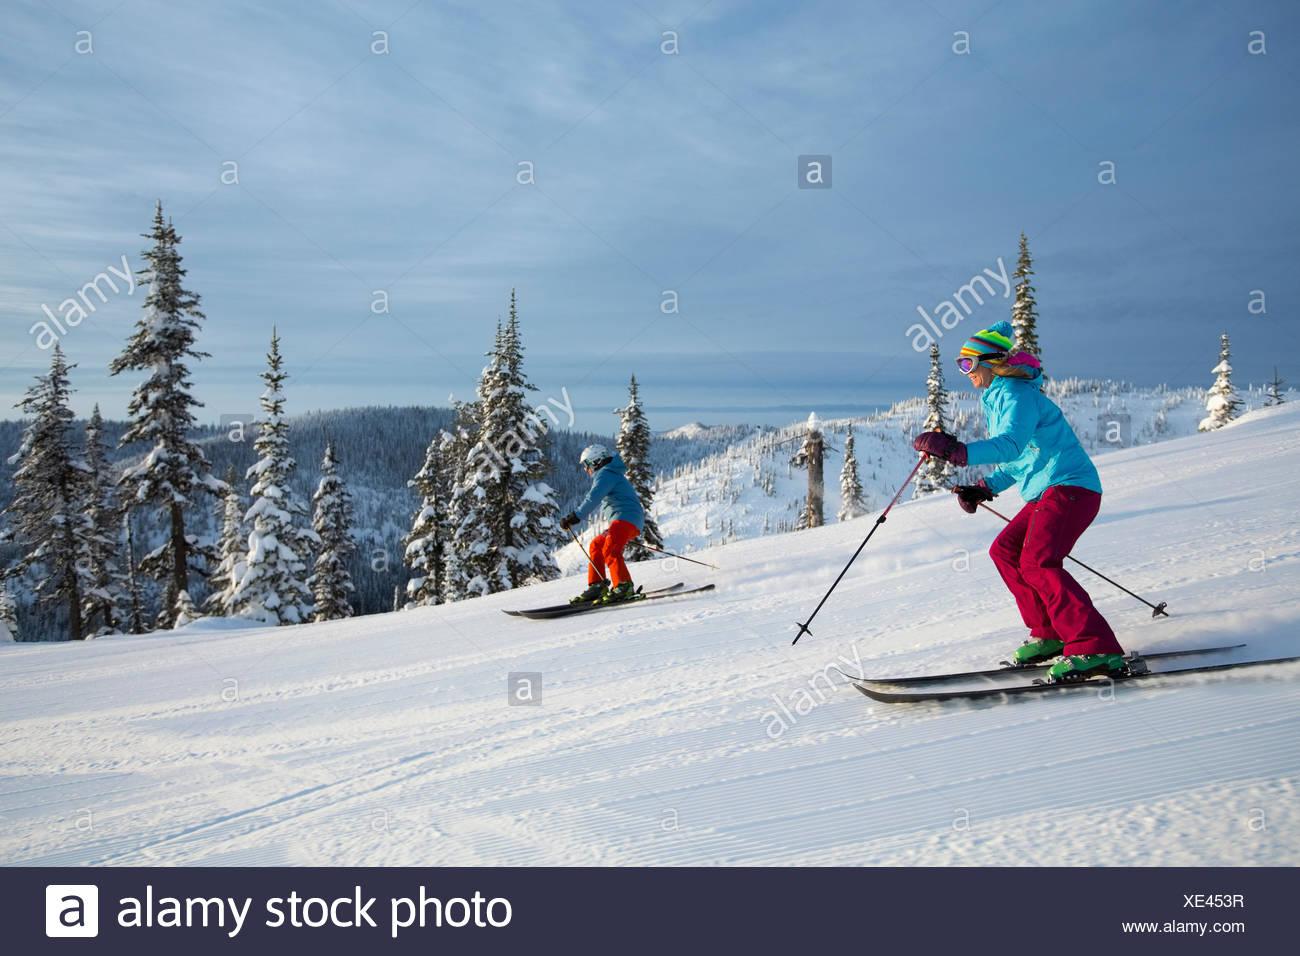 Vista lateral del esquí par Imagen De Stock